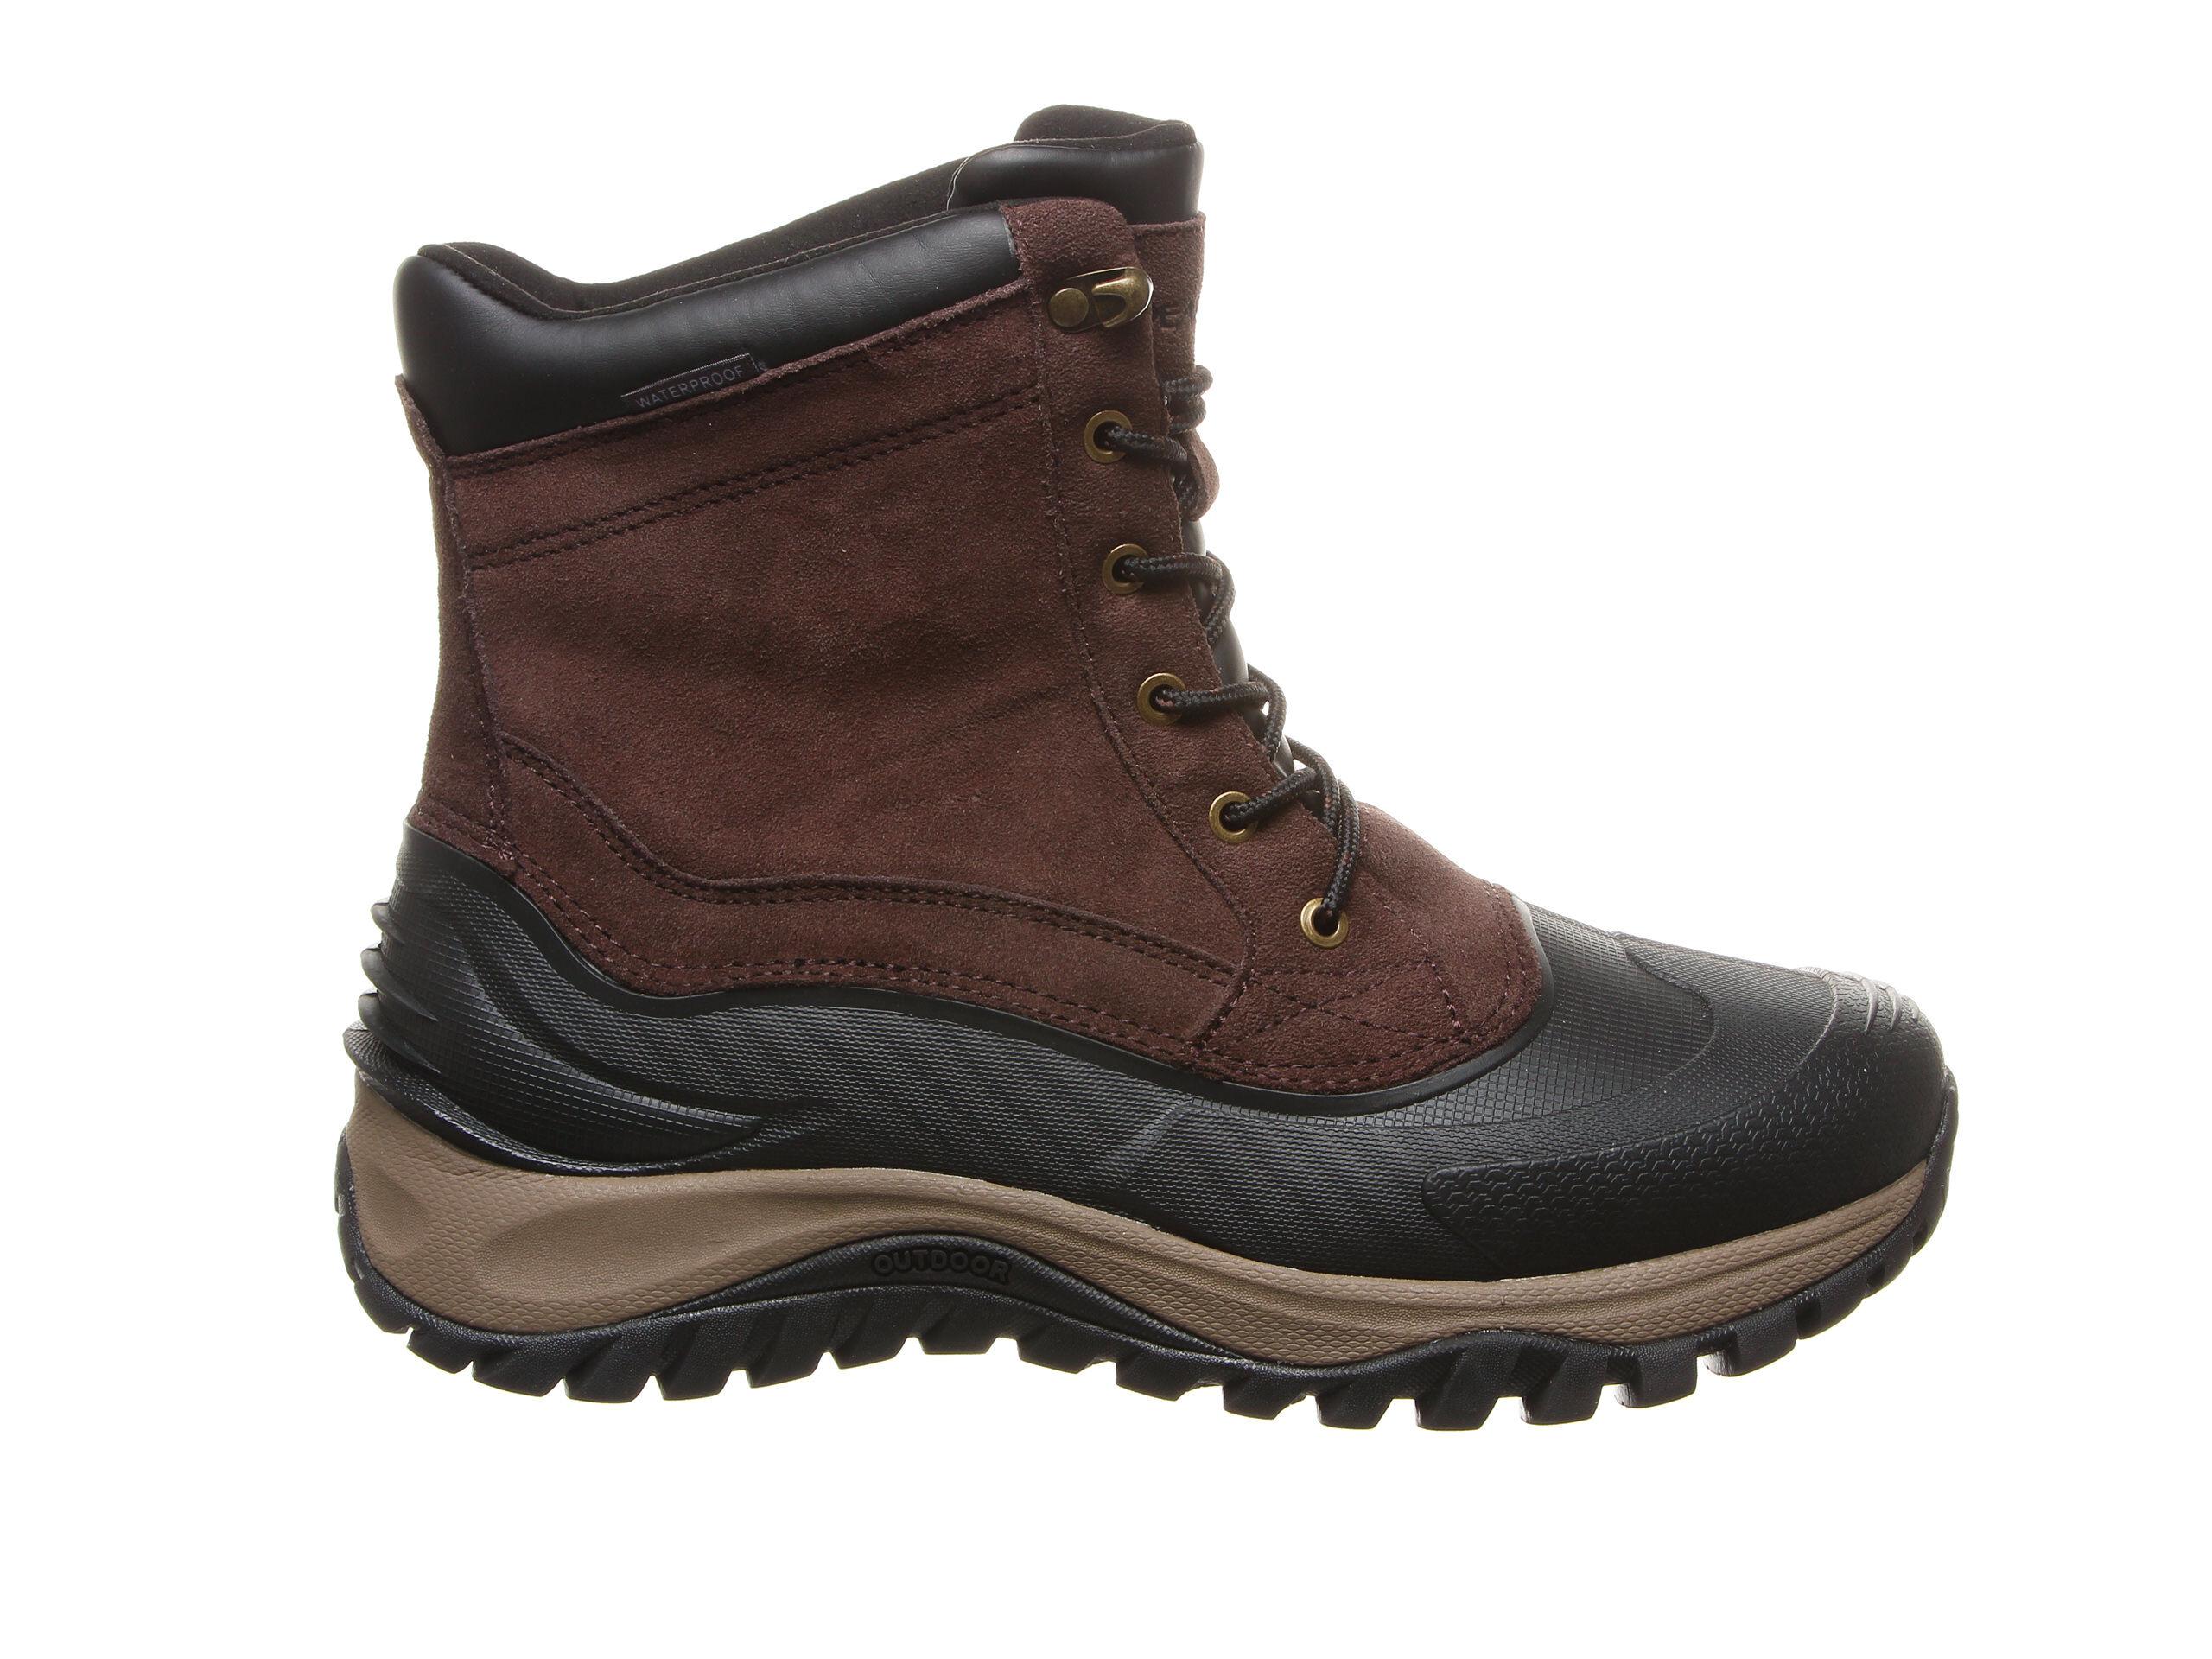 Men's Bearpaw Teton Winter Boots Chocolate